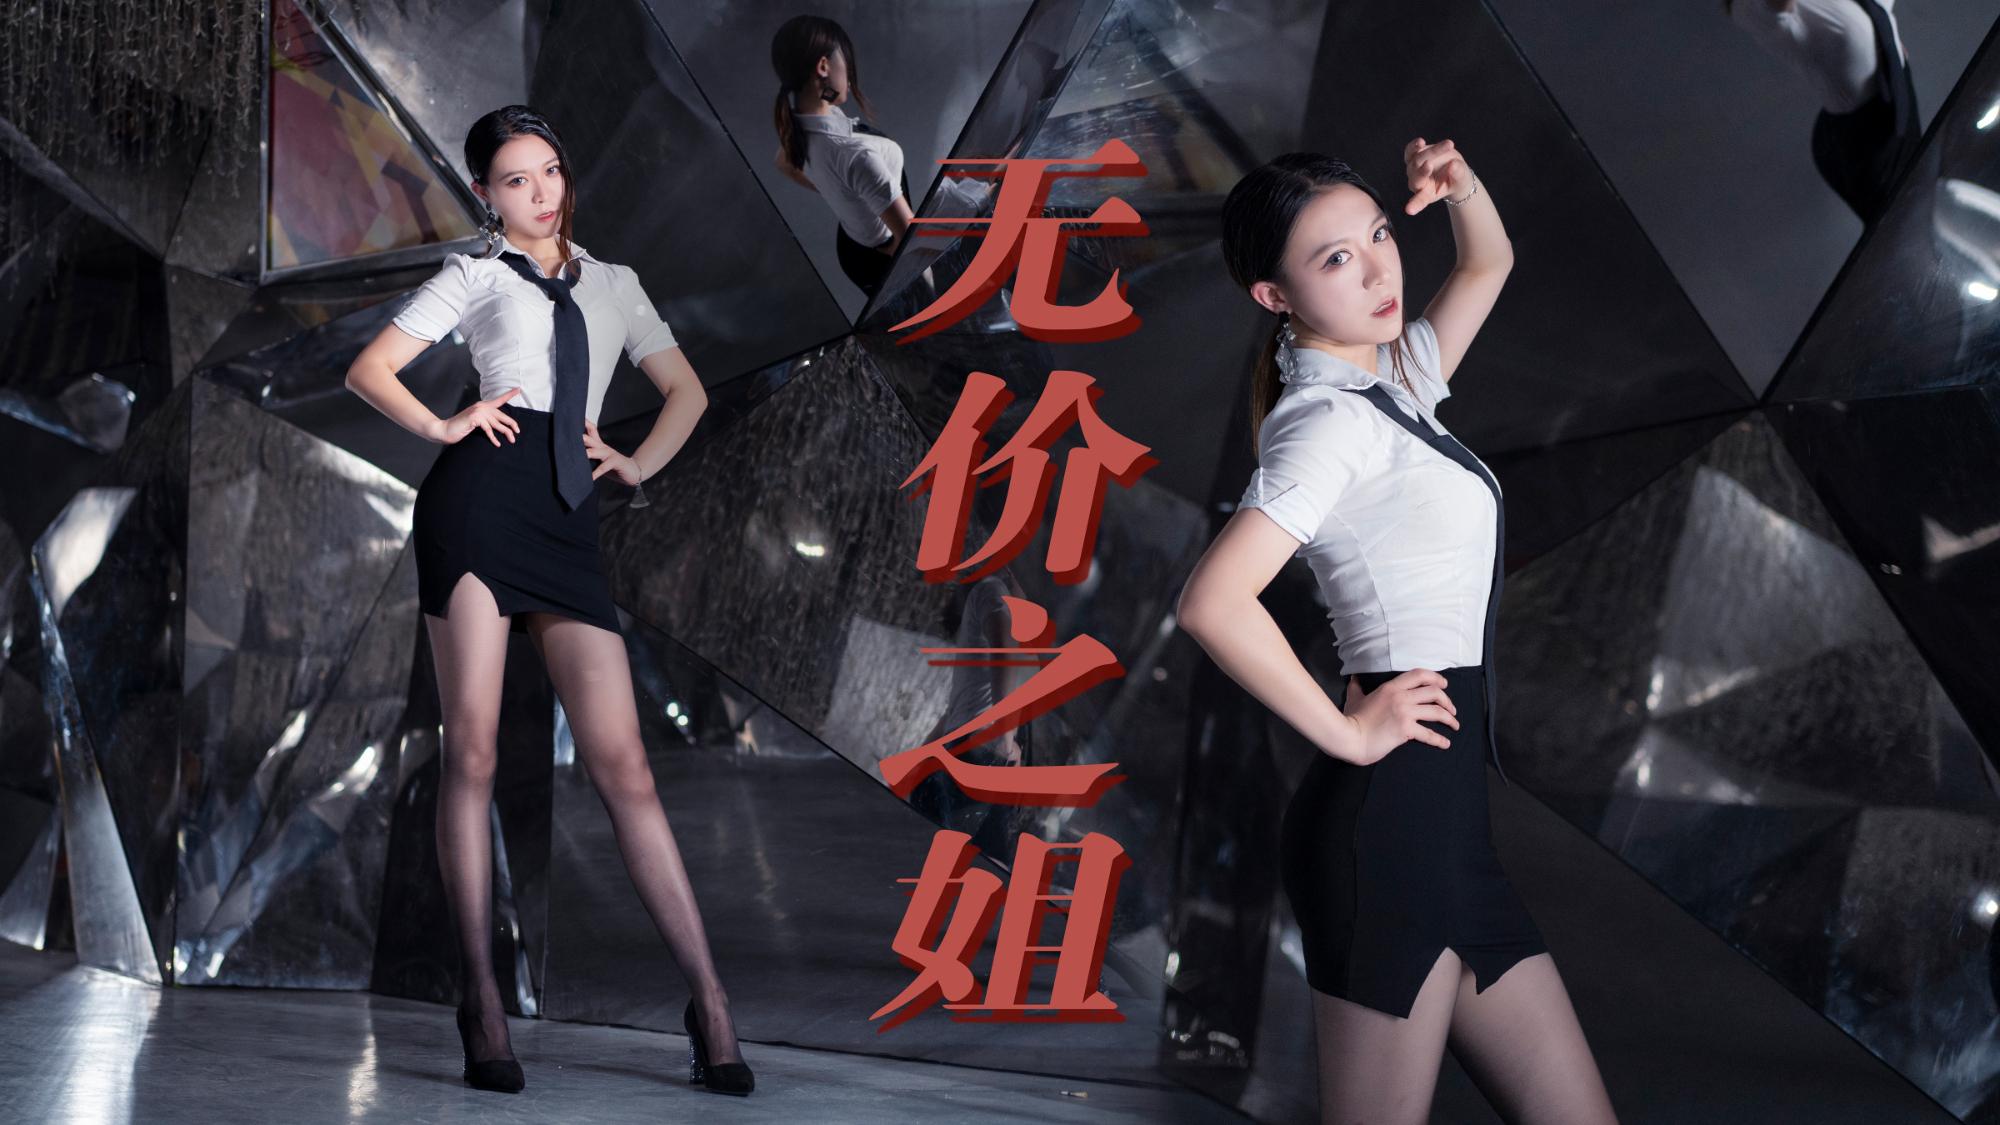 【Hami瑾】你们要的《无价之姐》秘书版4K竖屏